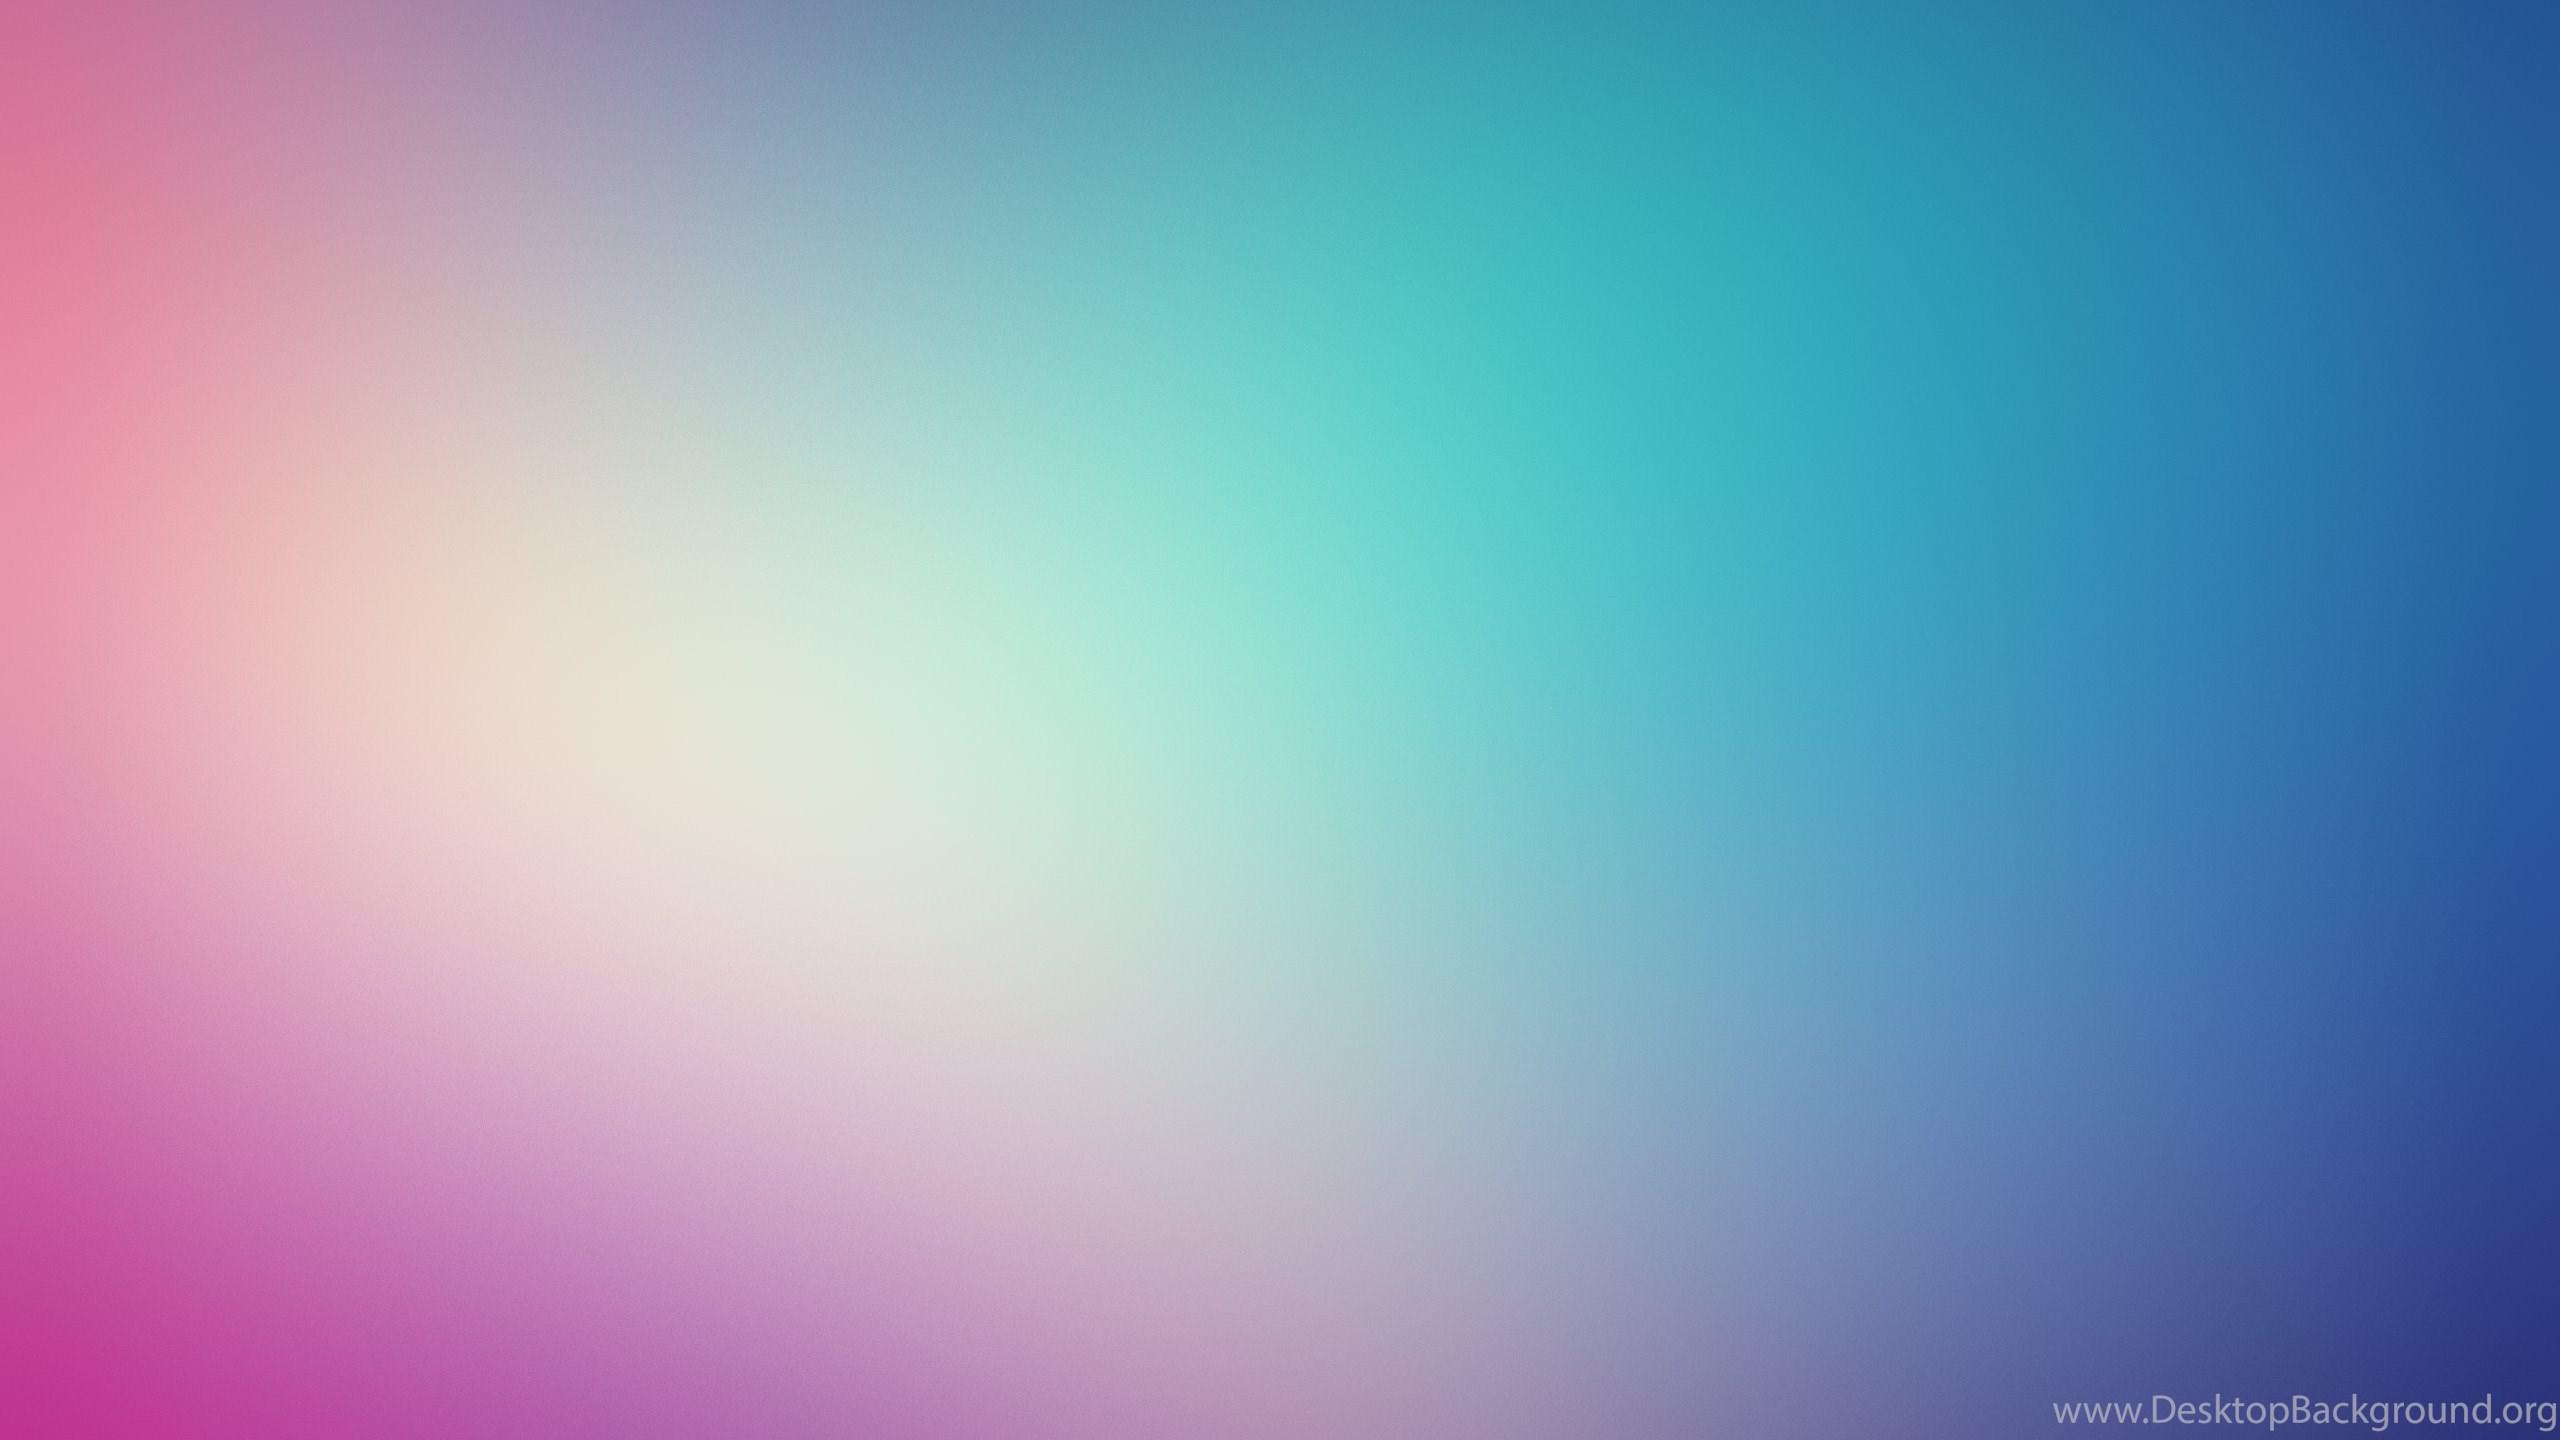 download 2560x1440 blue white - photo #44